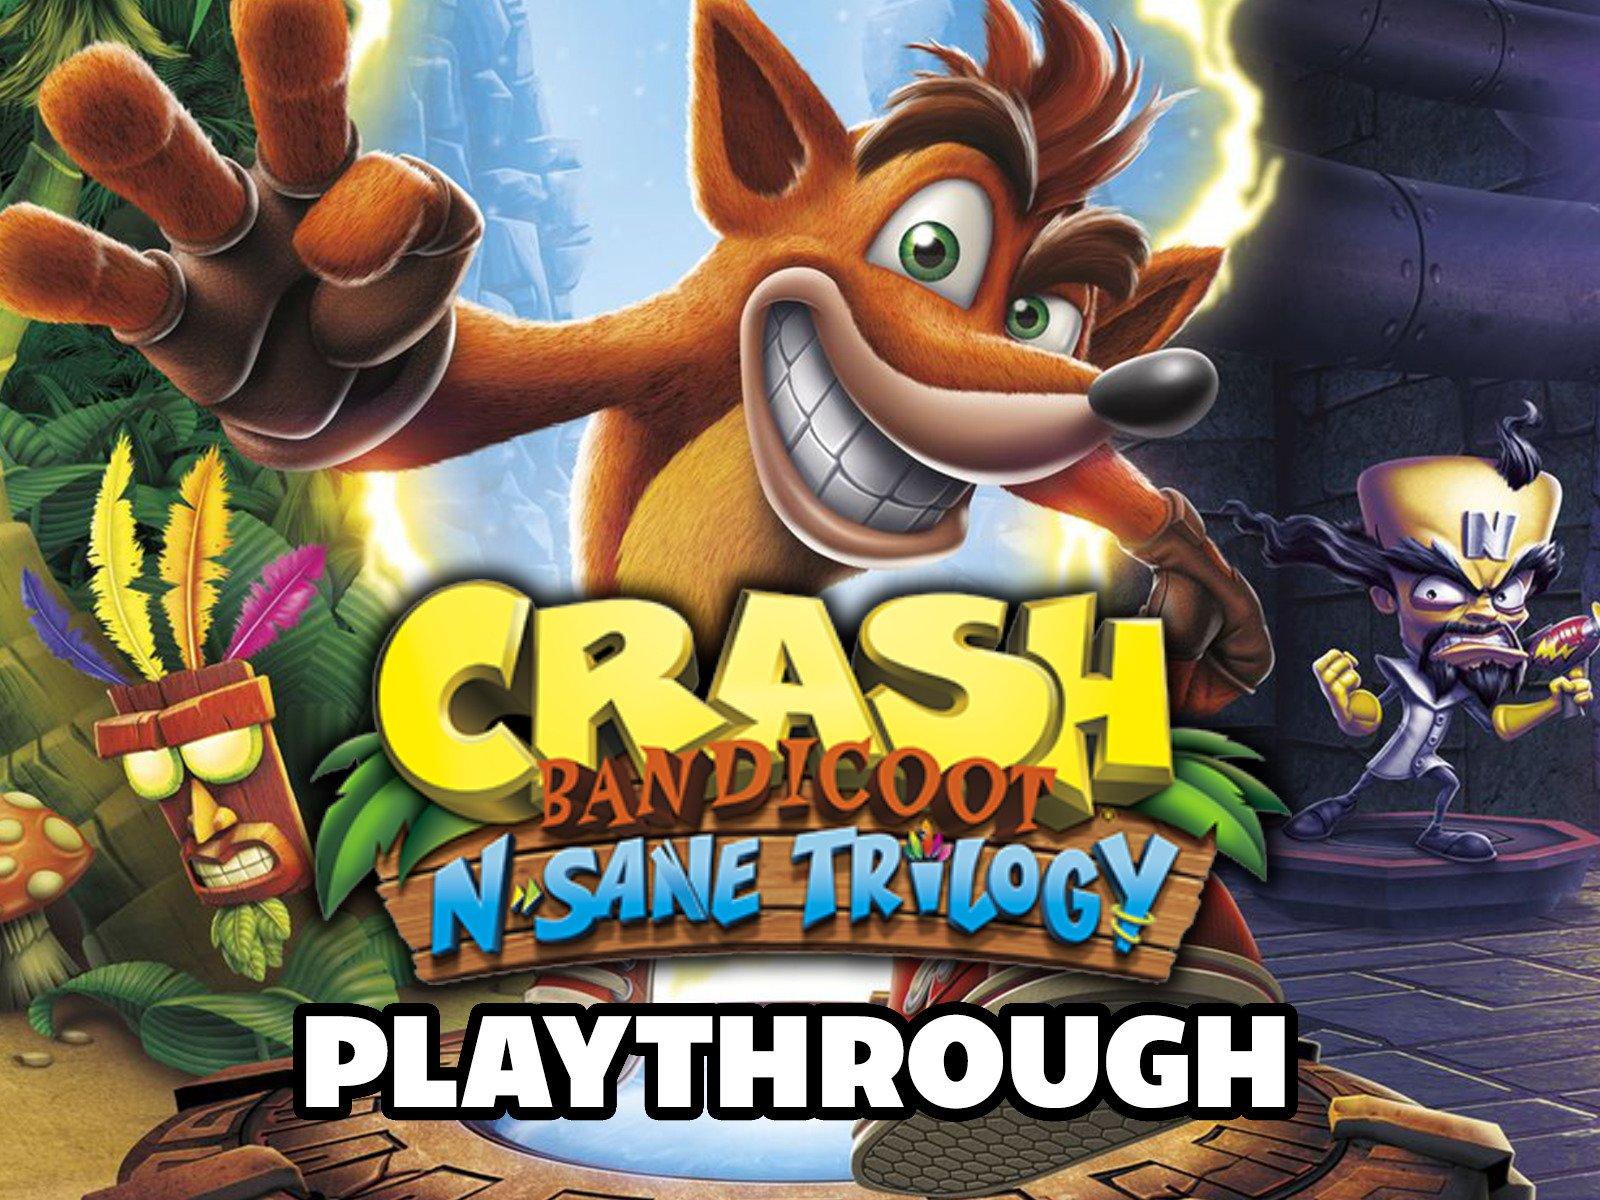 Clip: Crash Bandicoot N. Sane Trilogy Playthrough - Season 1